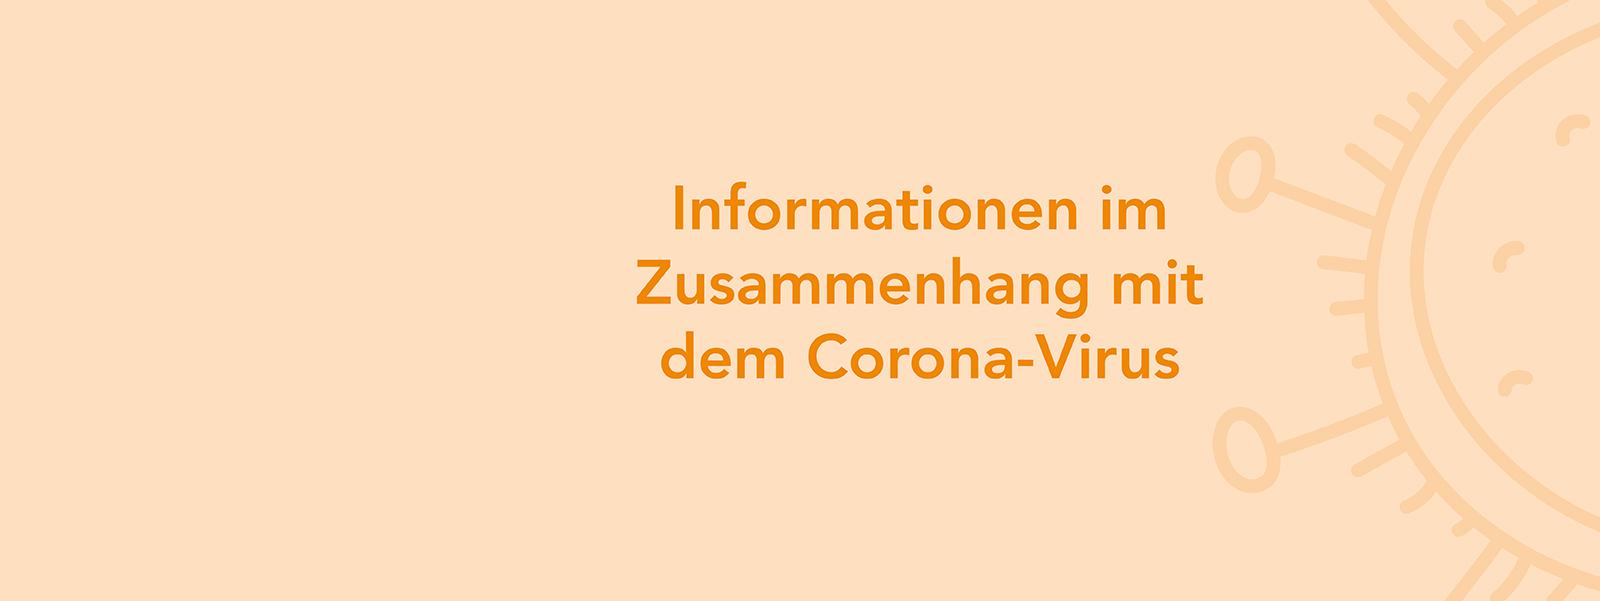 Corona-Virus Informationen